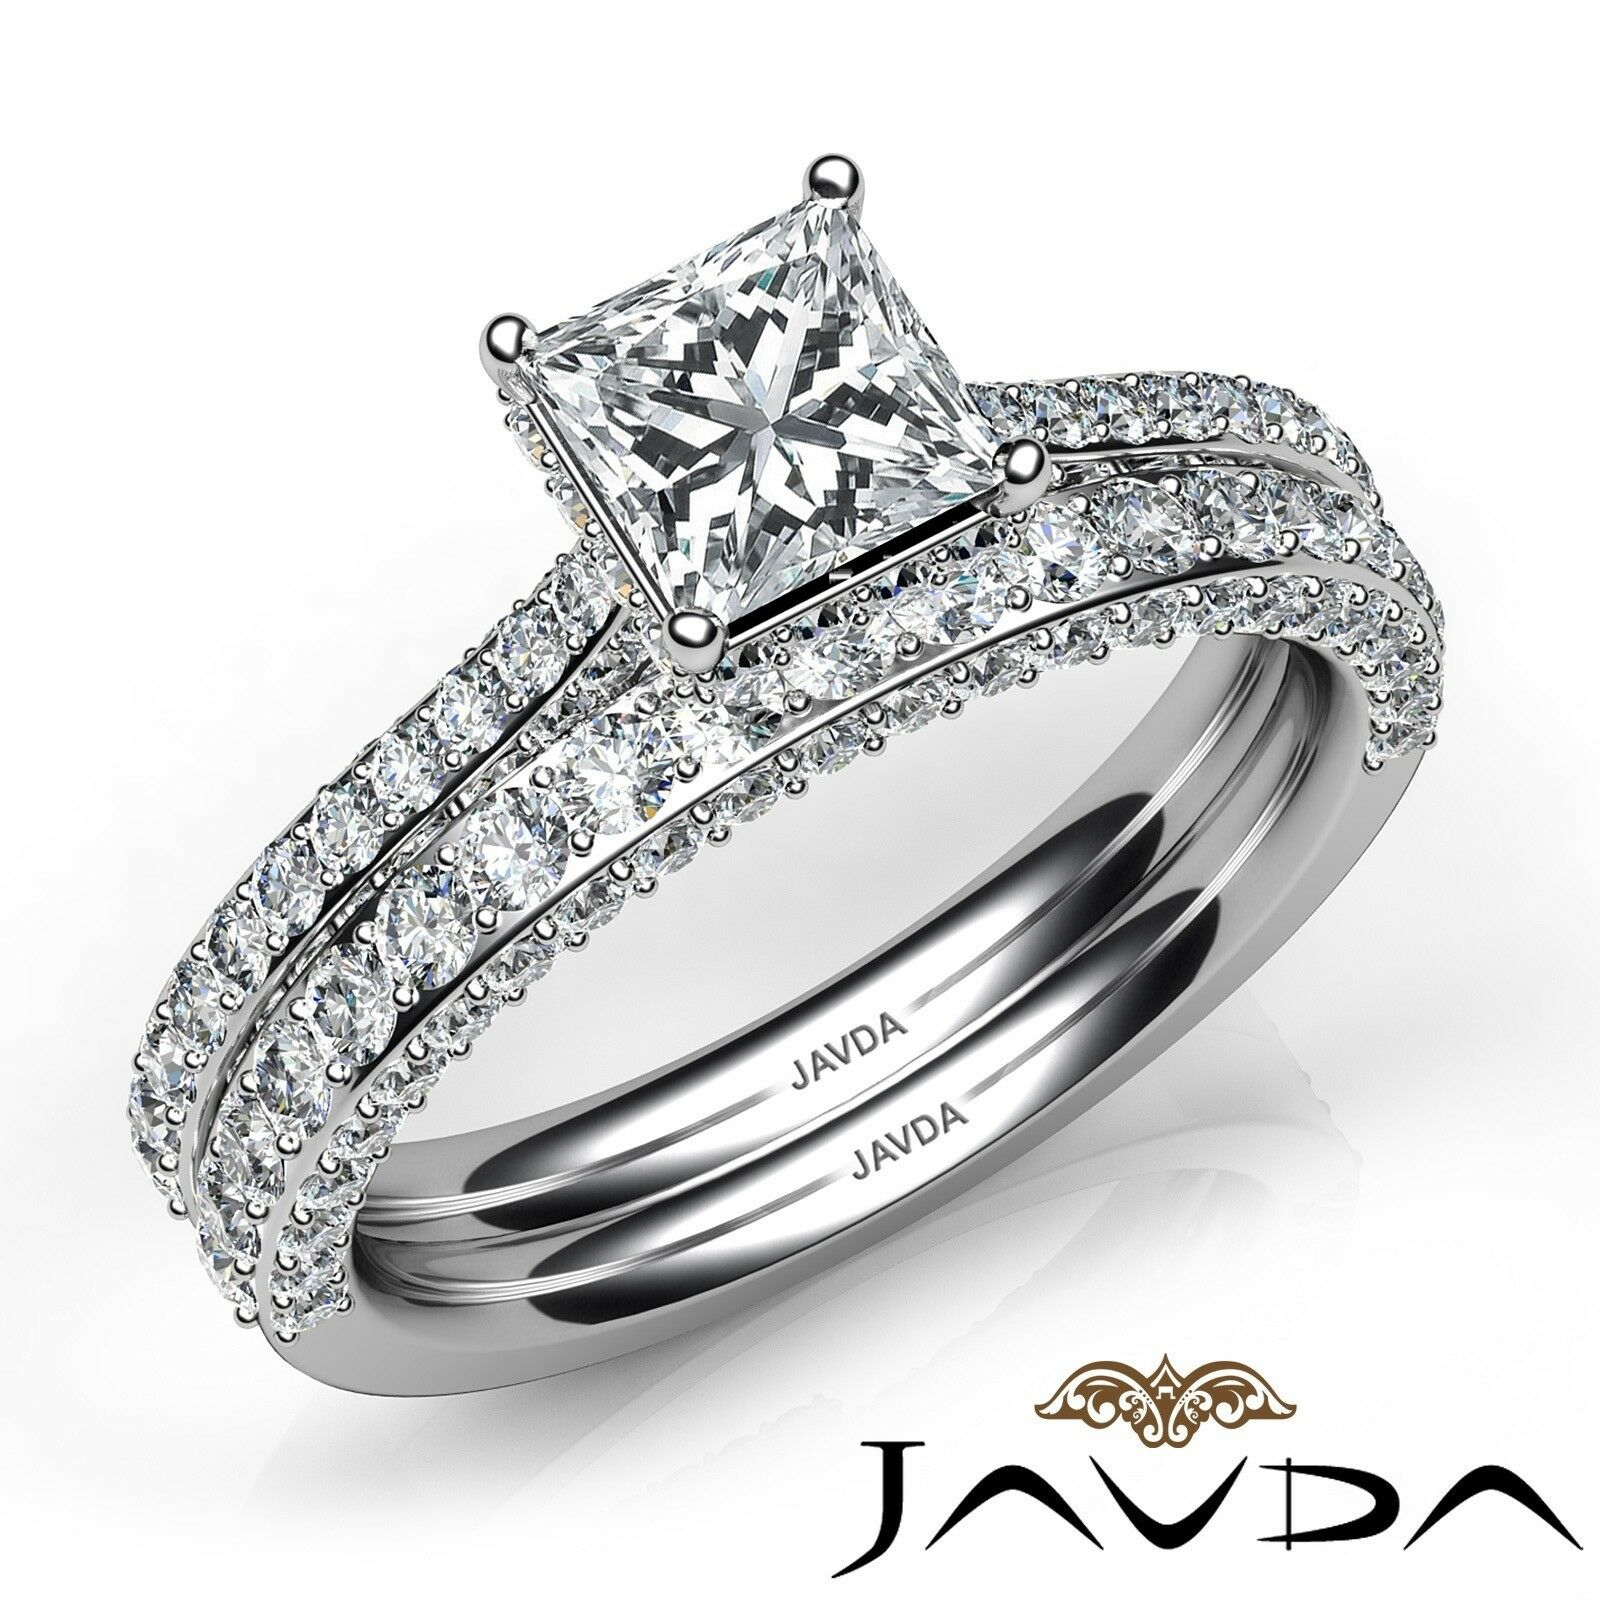 2.35ctw Circa Halo Pave Wedding Set Princess Diamond Engagement Ring GIA G-VVS1 1